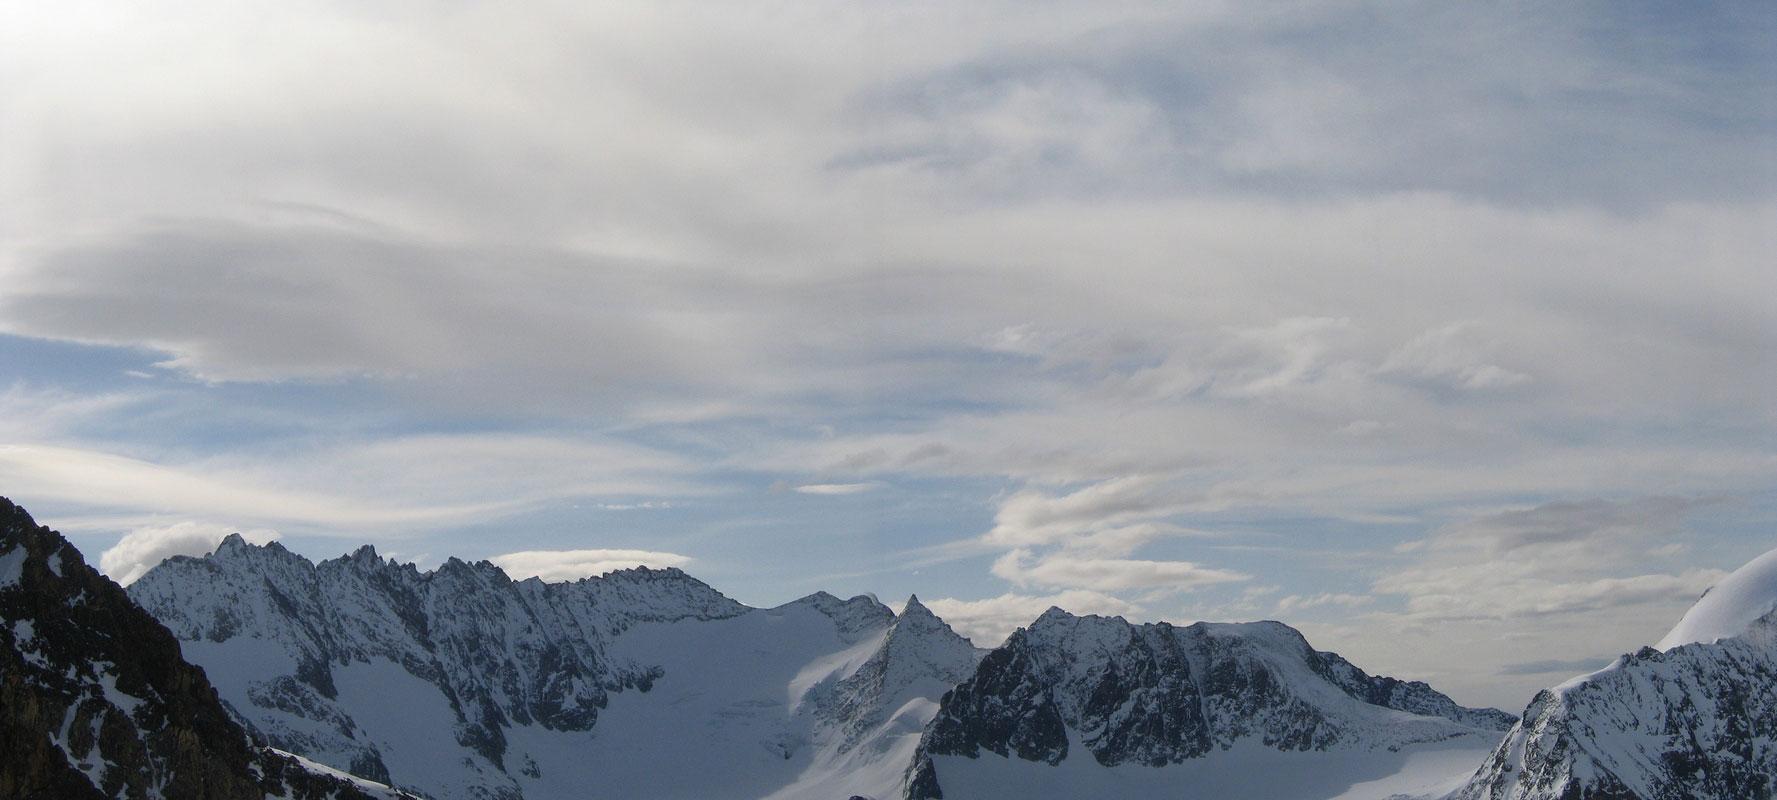 Pigne Arolla, Day 5 H.R. Chamonix-Zermatt Walliser Alpen / Alpes valaisannes Švýcarsko panorama 40